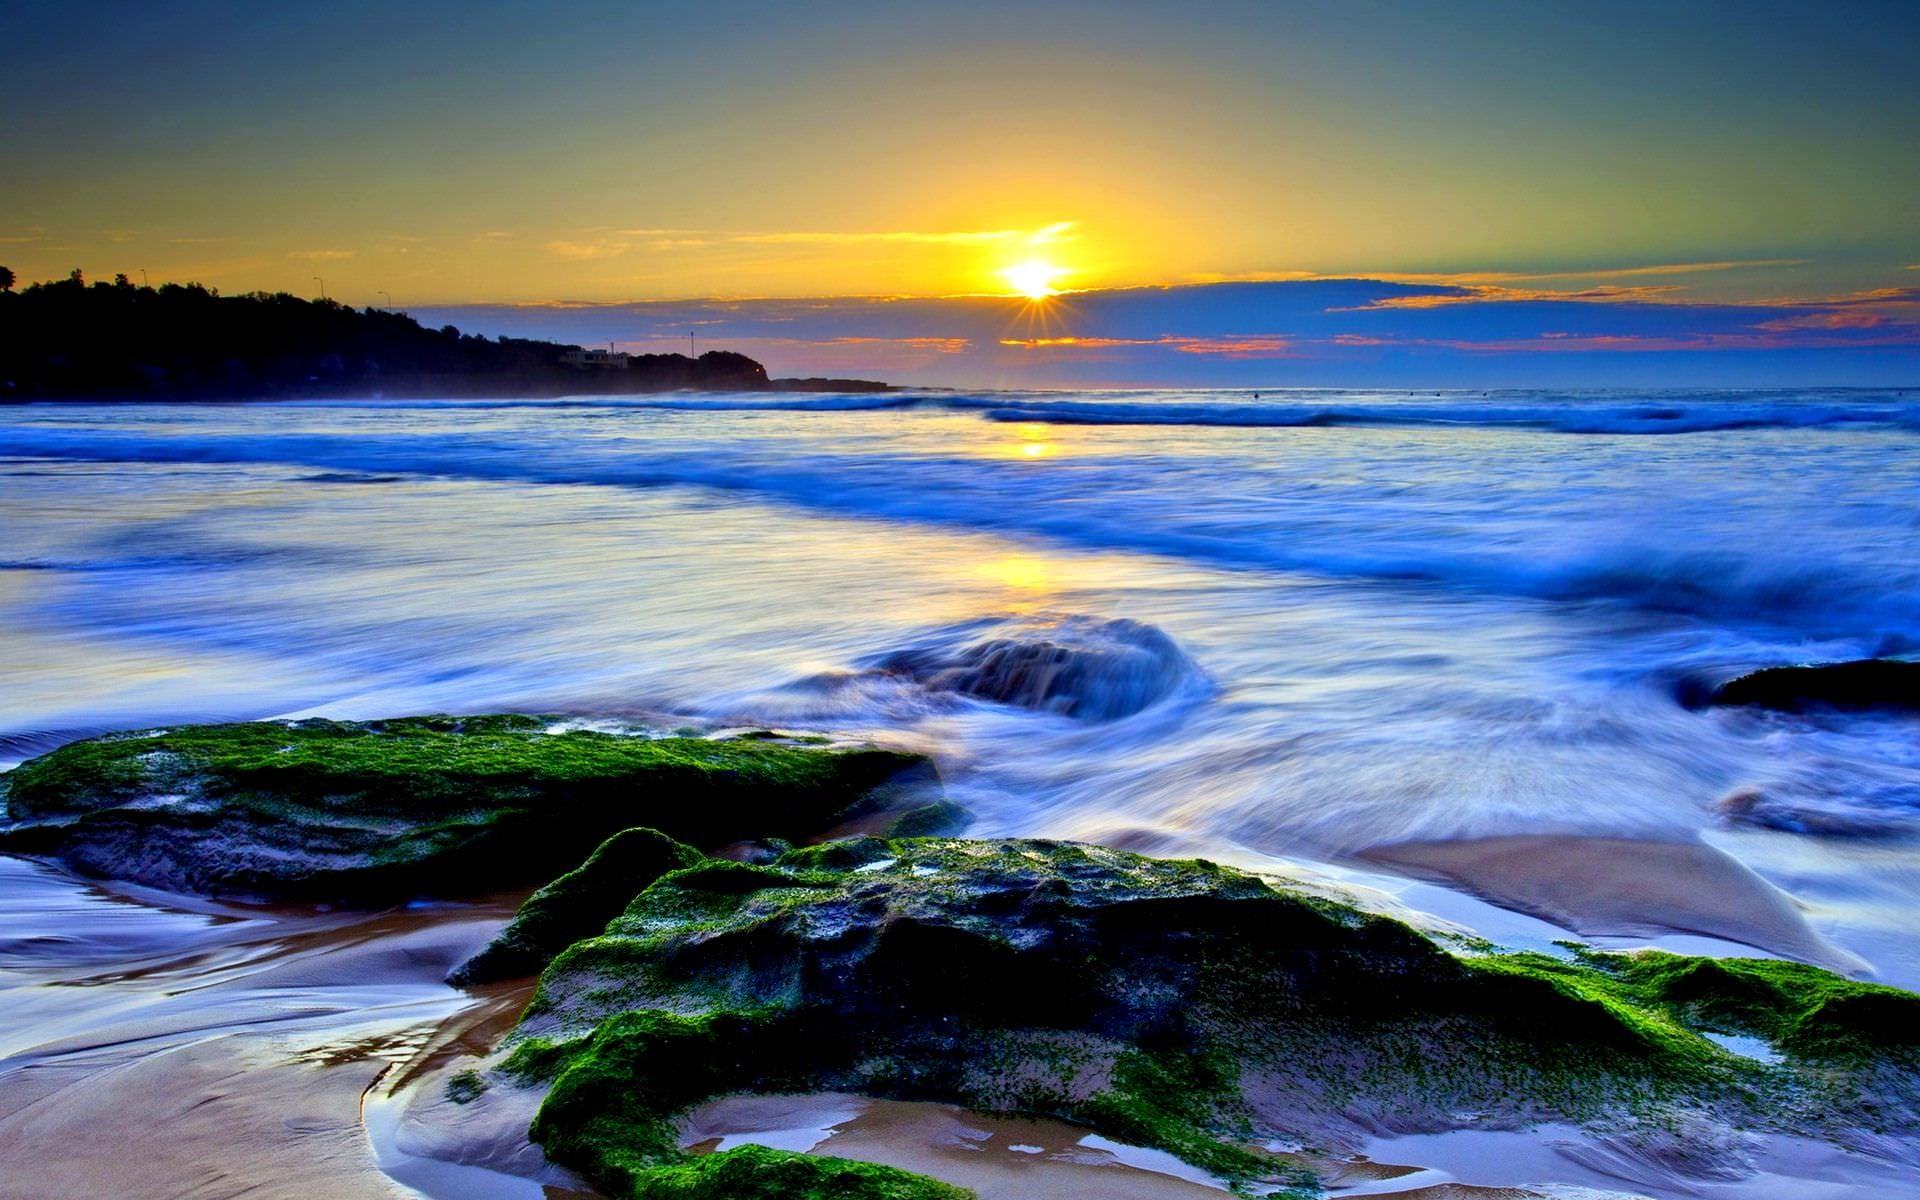 Beautiful Beach Wallpapers: Most Beautiful Beach Wallpaper (56+ Images